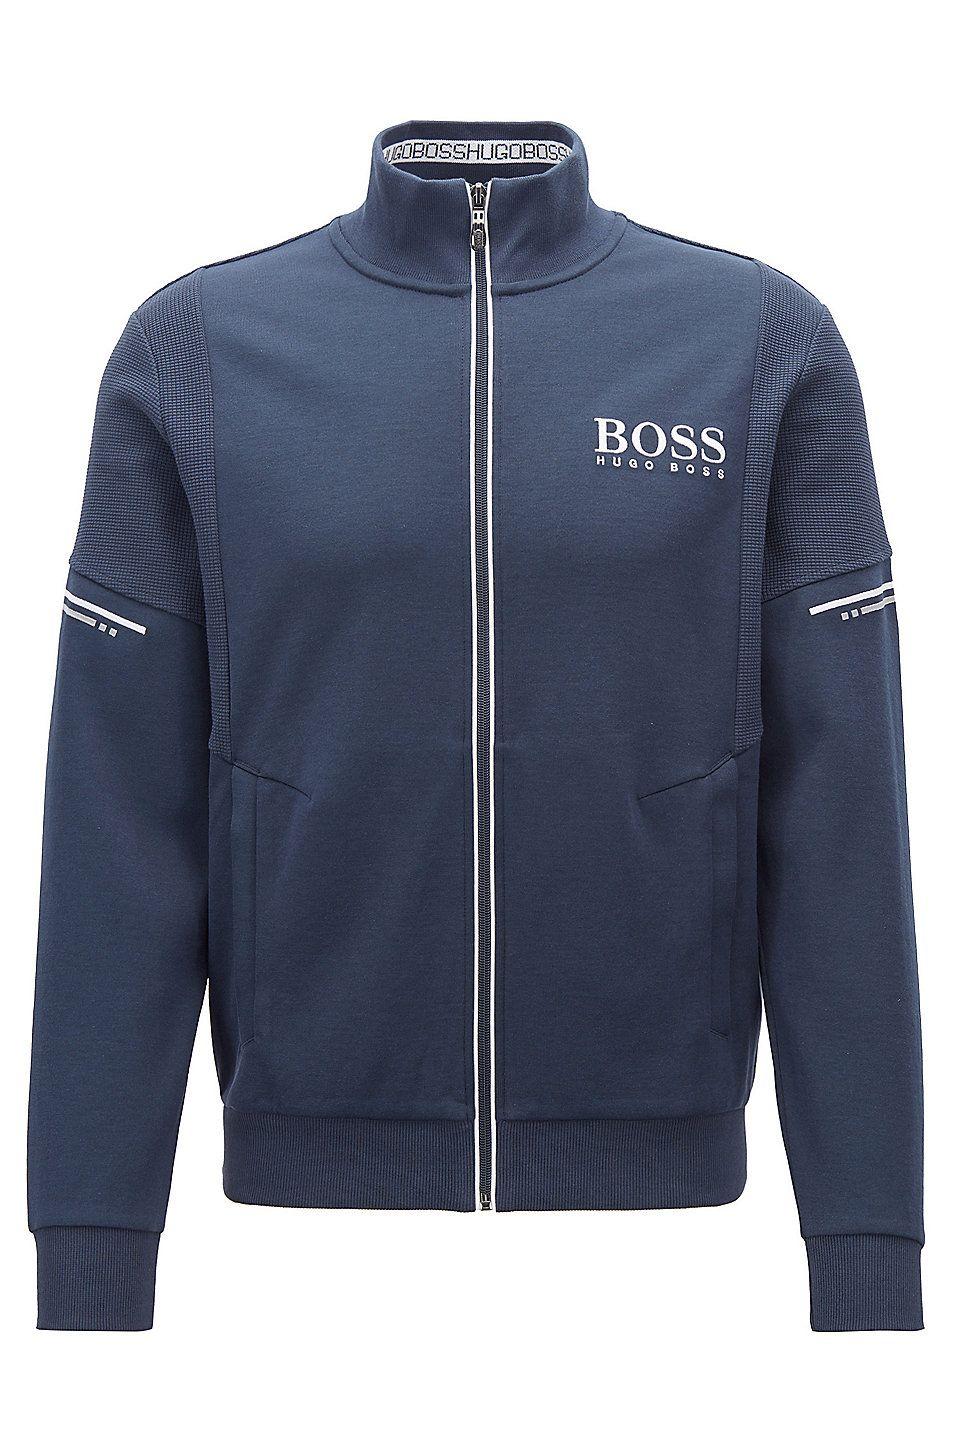 Hugo Boss Men/'s Relaxed Fit Hooded Sweatshirt Sweater Hoodie Track Jacket